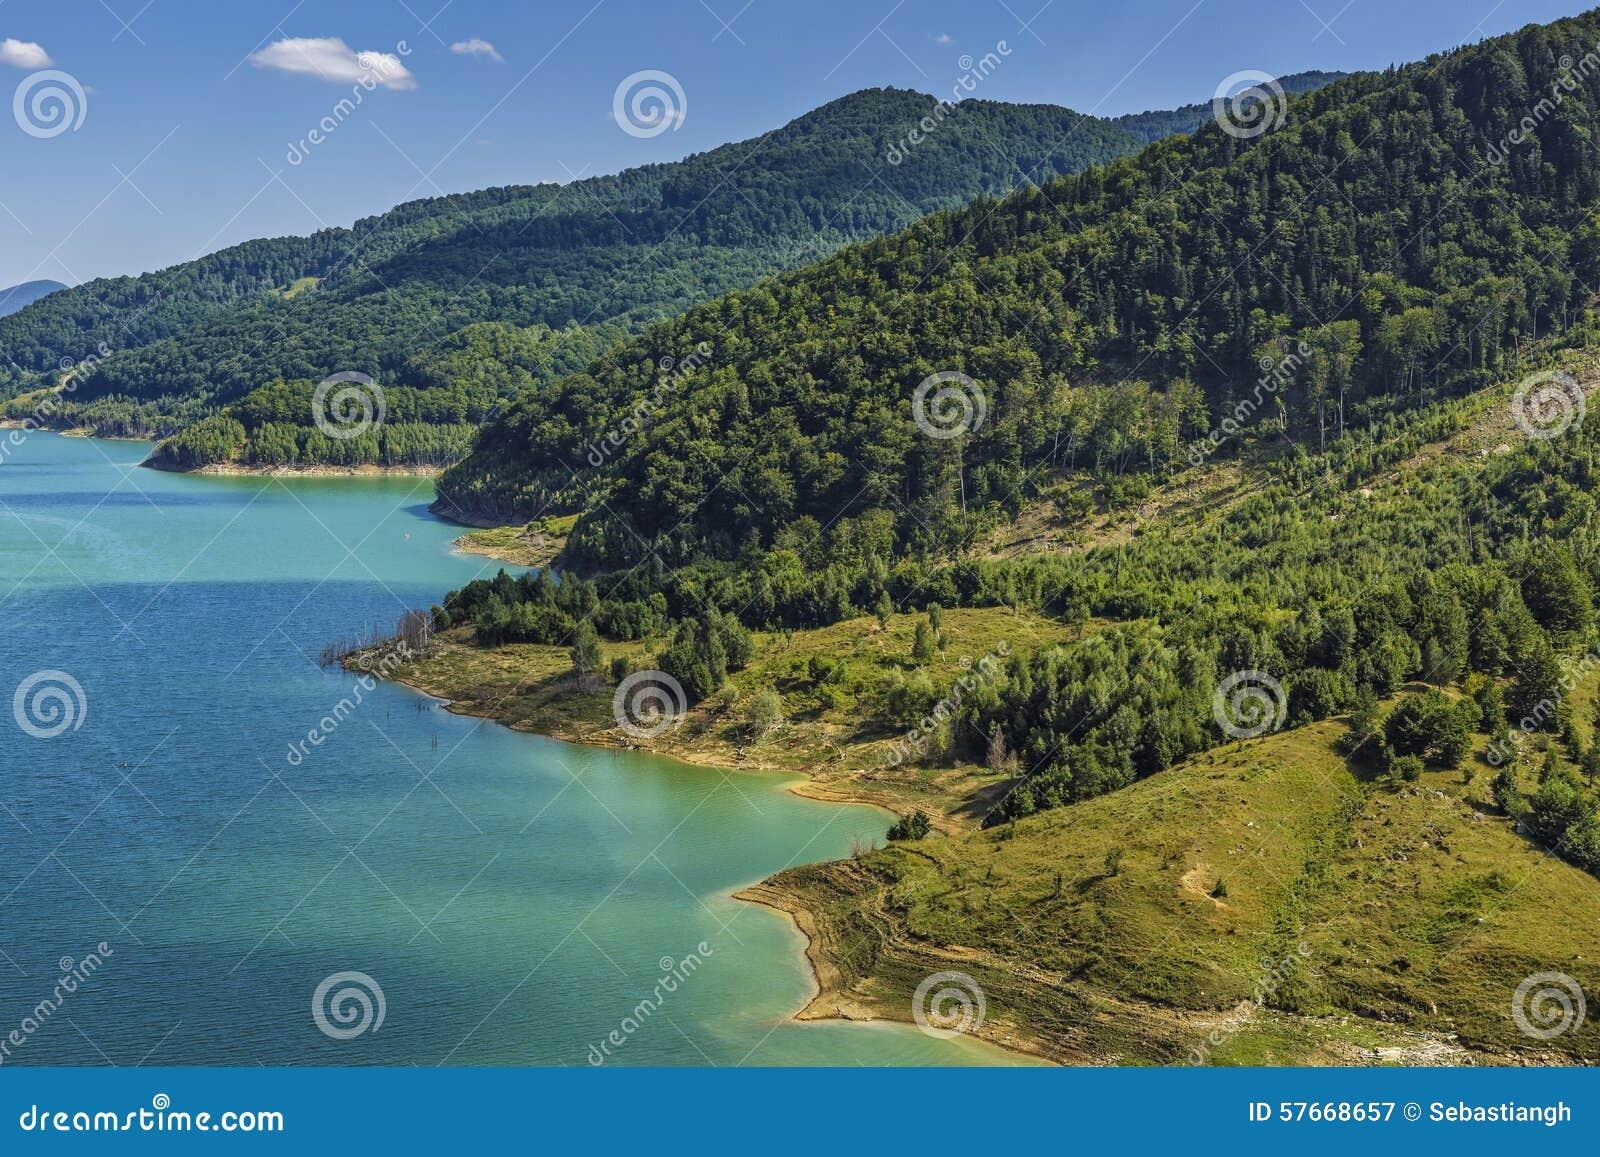 Naturalna sceneria z jeziorem